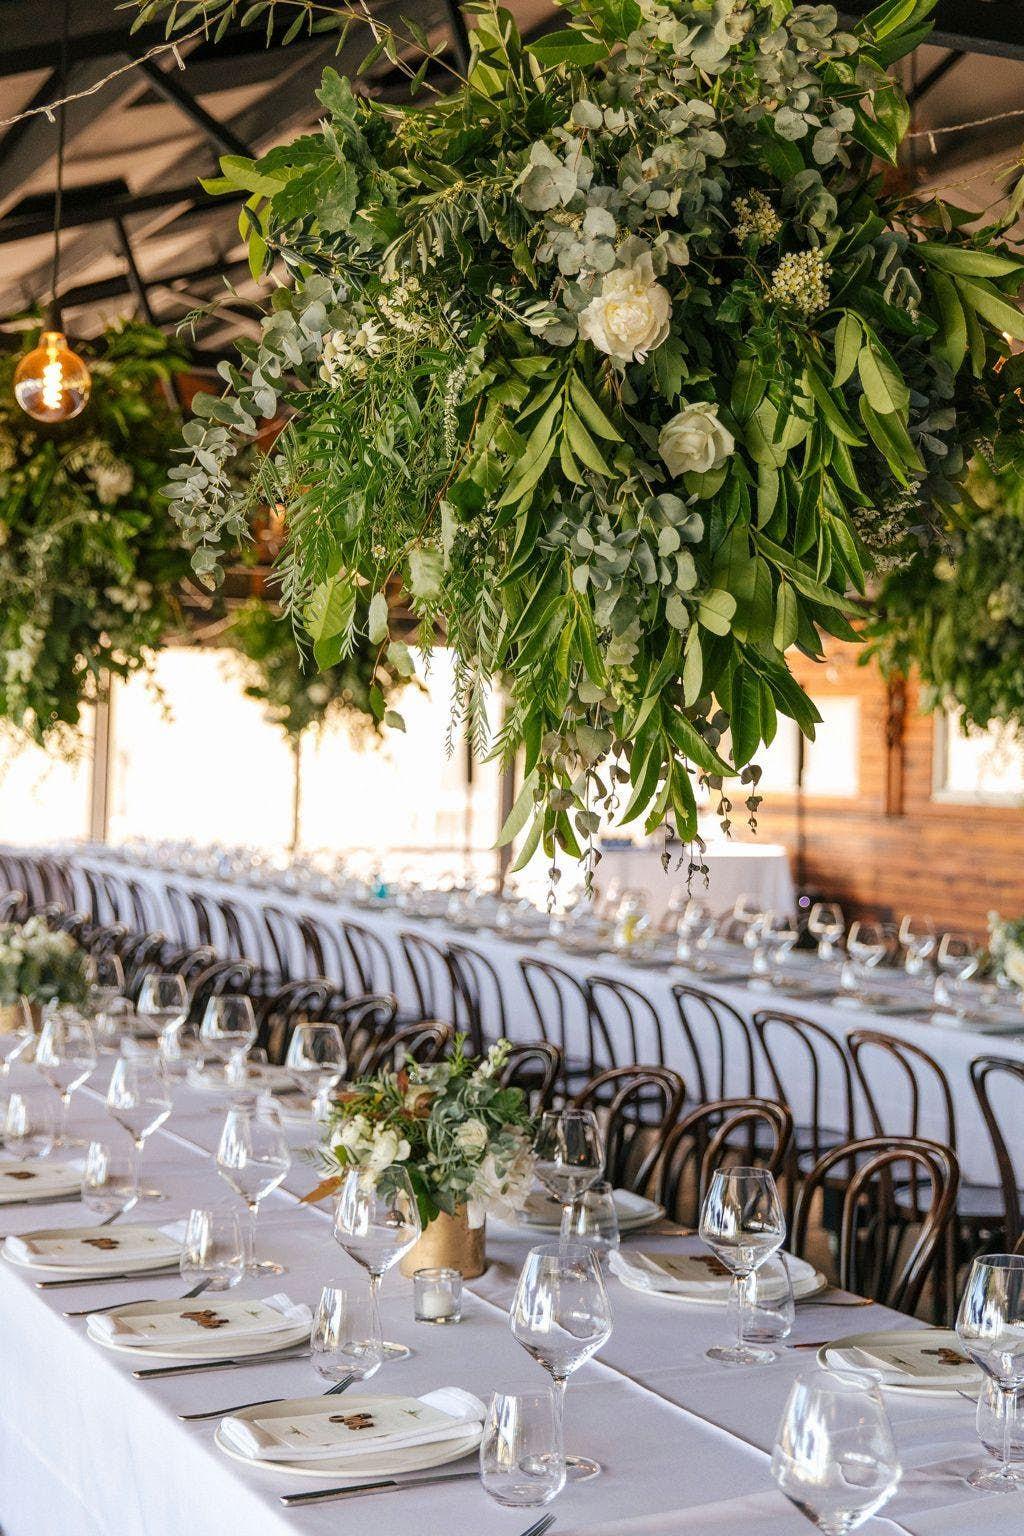 Zonzo Estate Yarra Valley Wedding Photographer - Mornington Peninsula Wedding Photographer